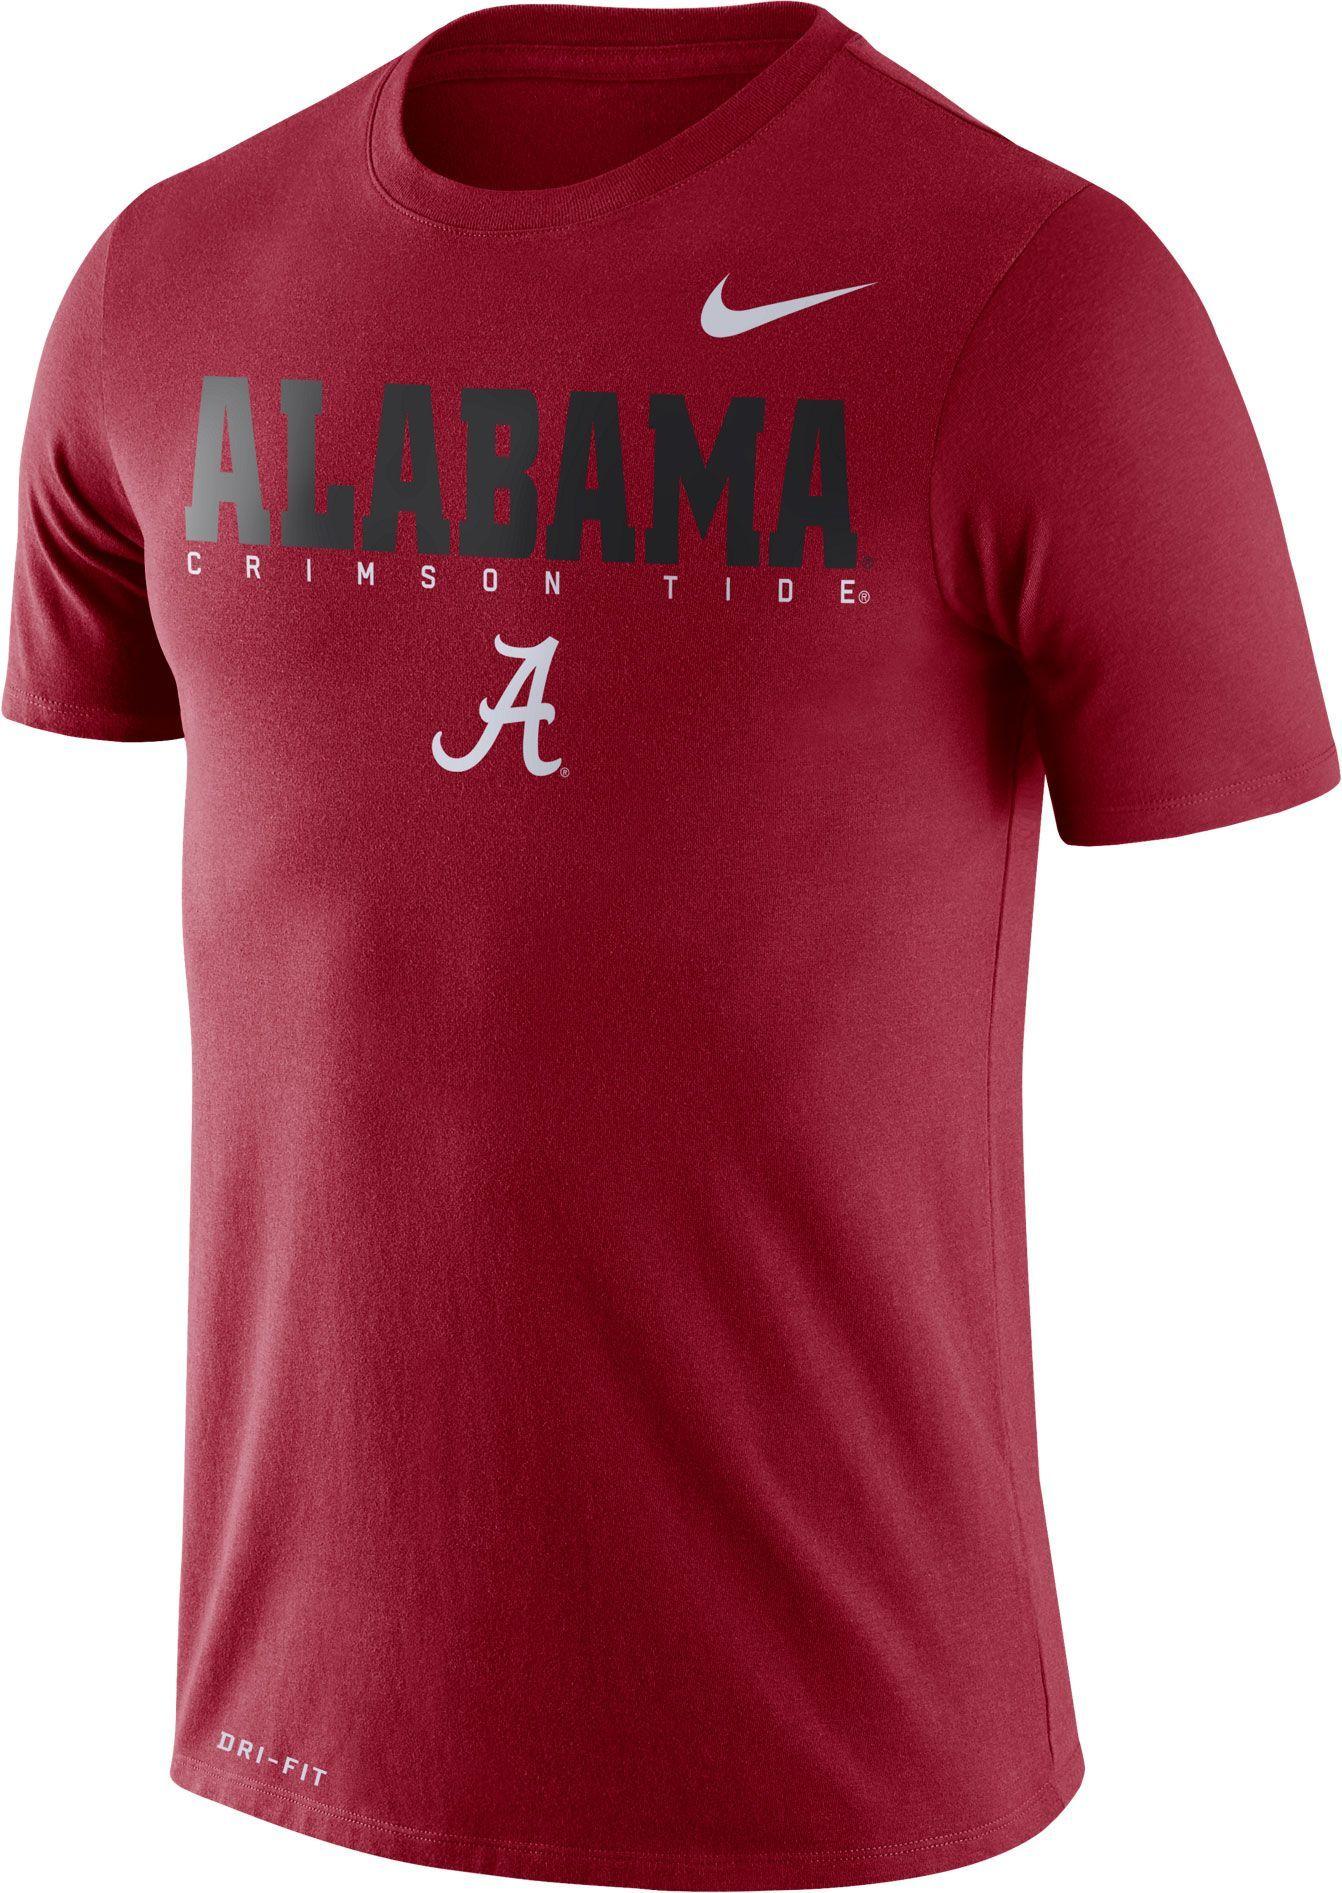 pretty nice 5bb3b 4cf27 Nike Men's Alabama Crimson Tide Crimson Football Dri-FIT ...